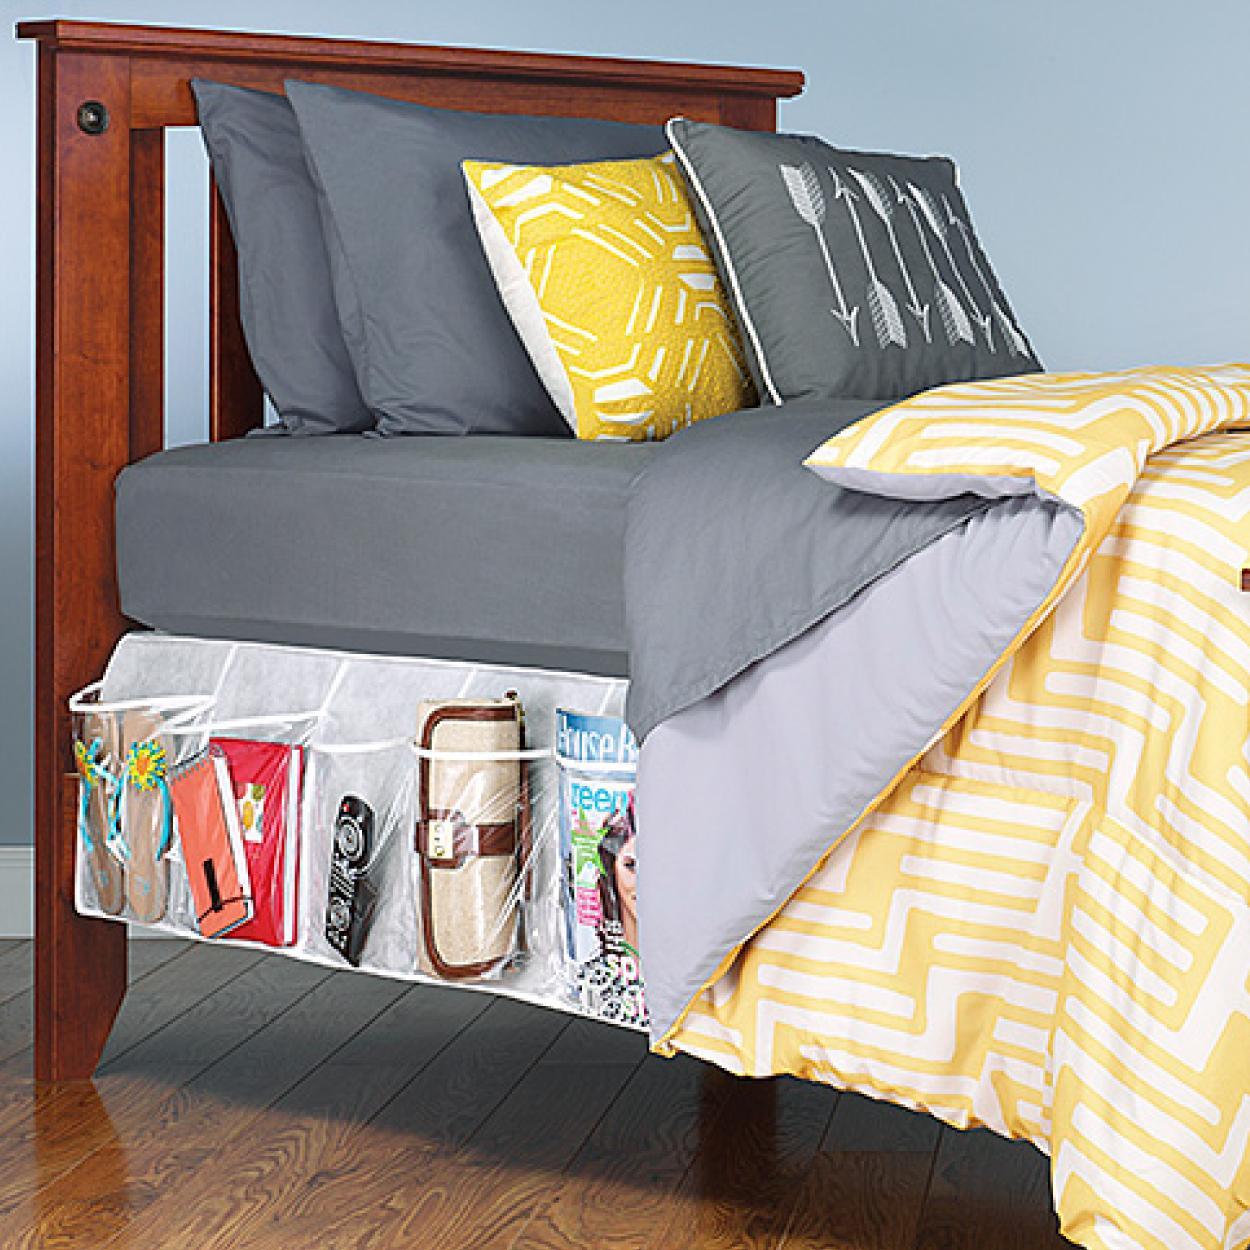 Bunk Bed Storage Pouch